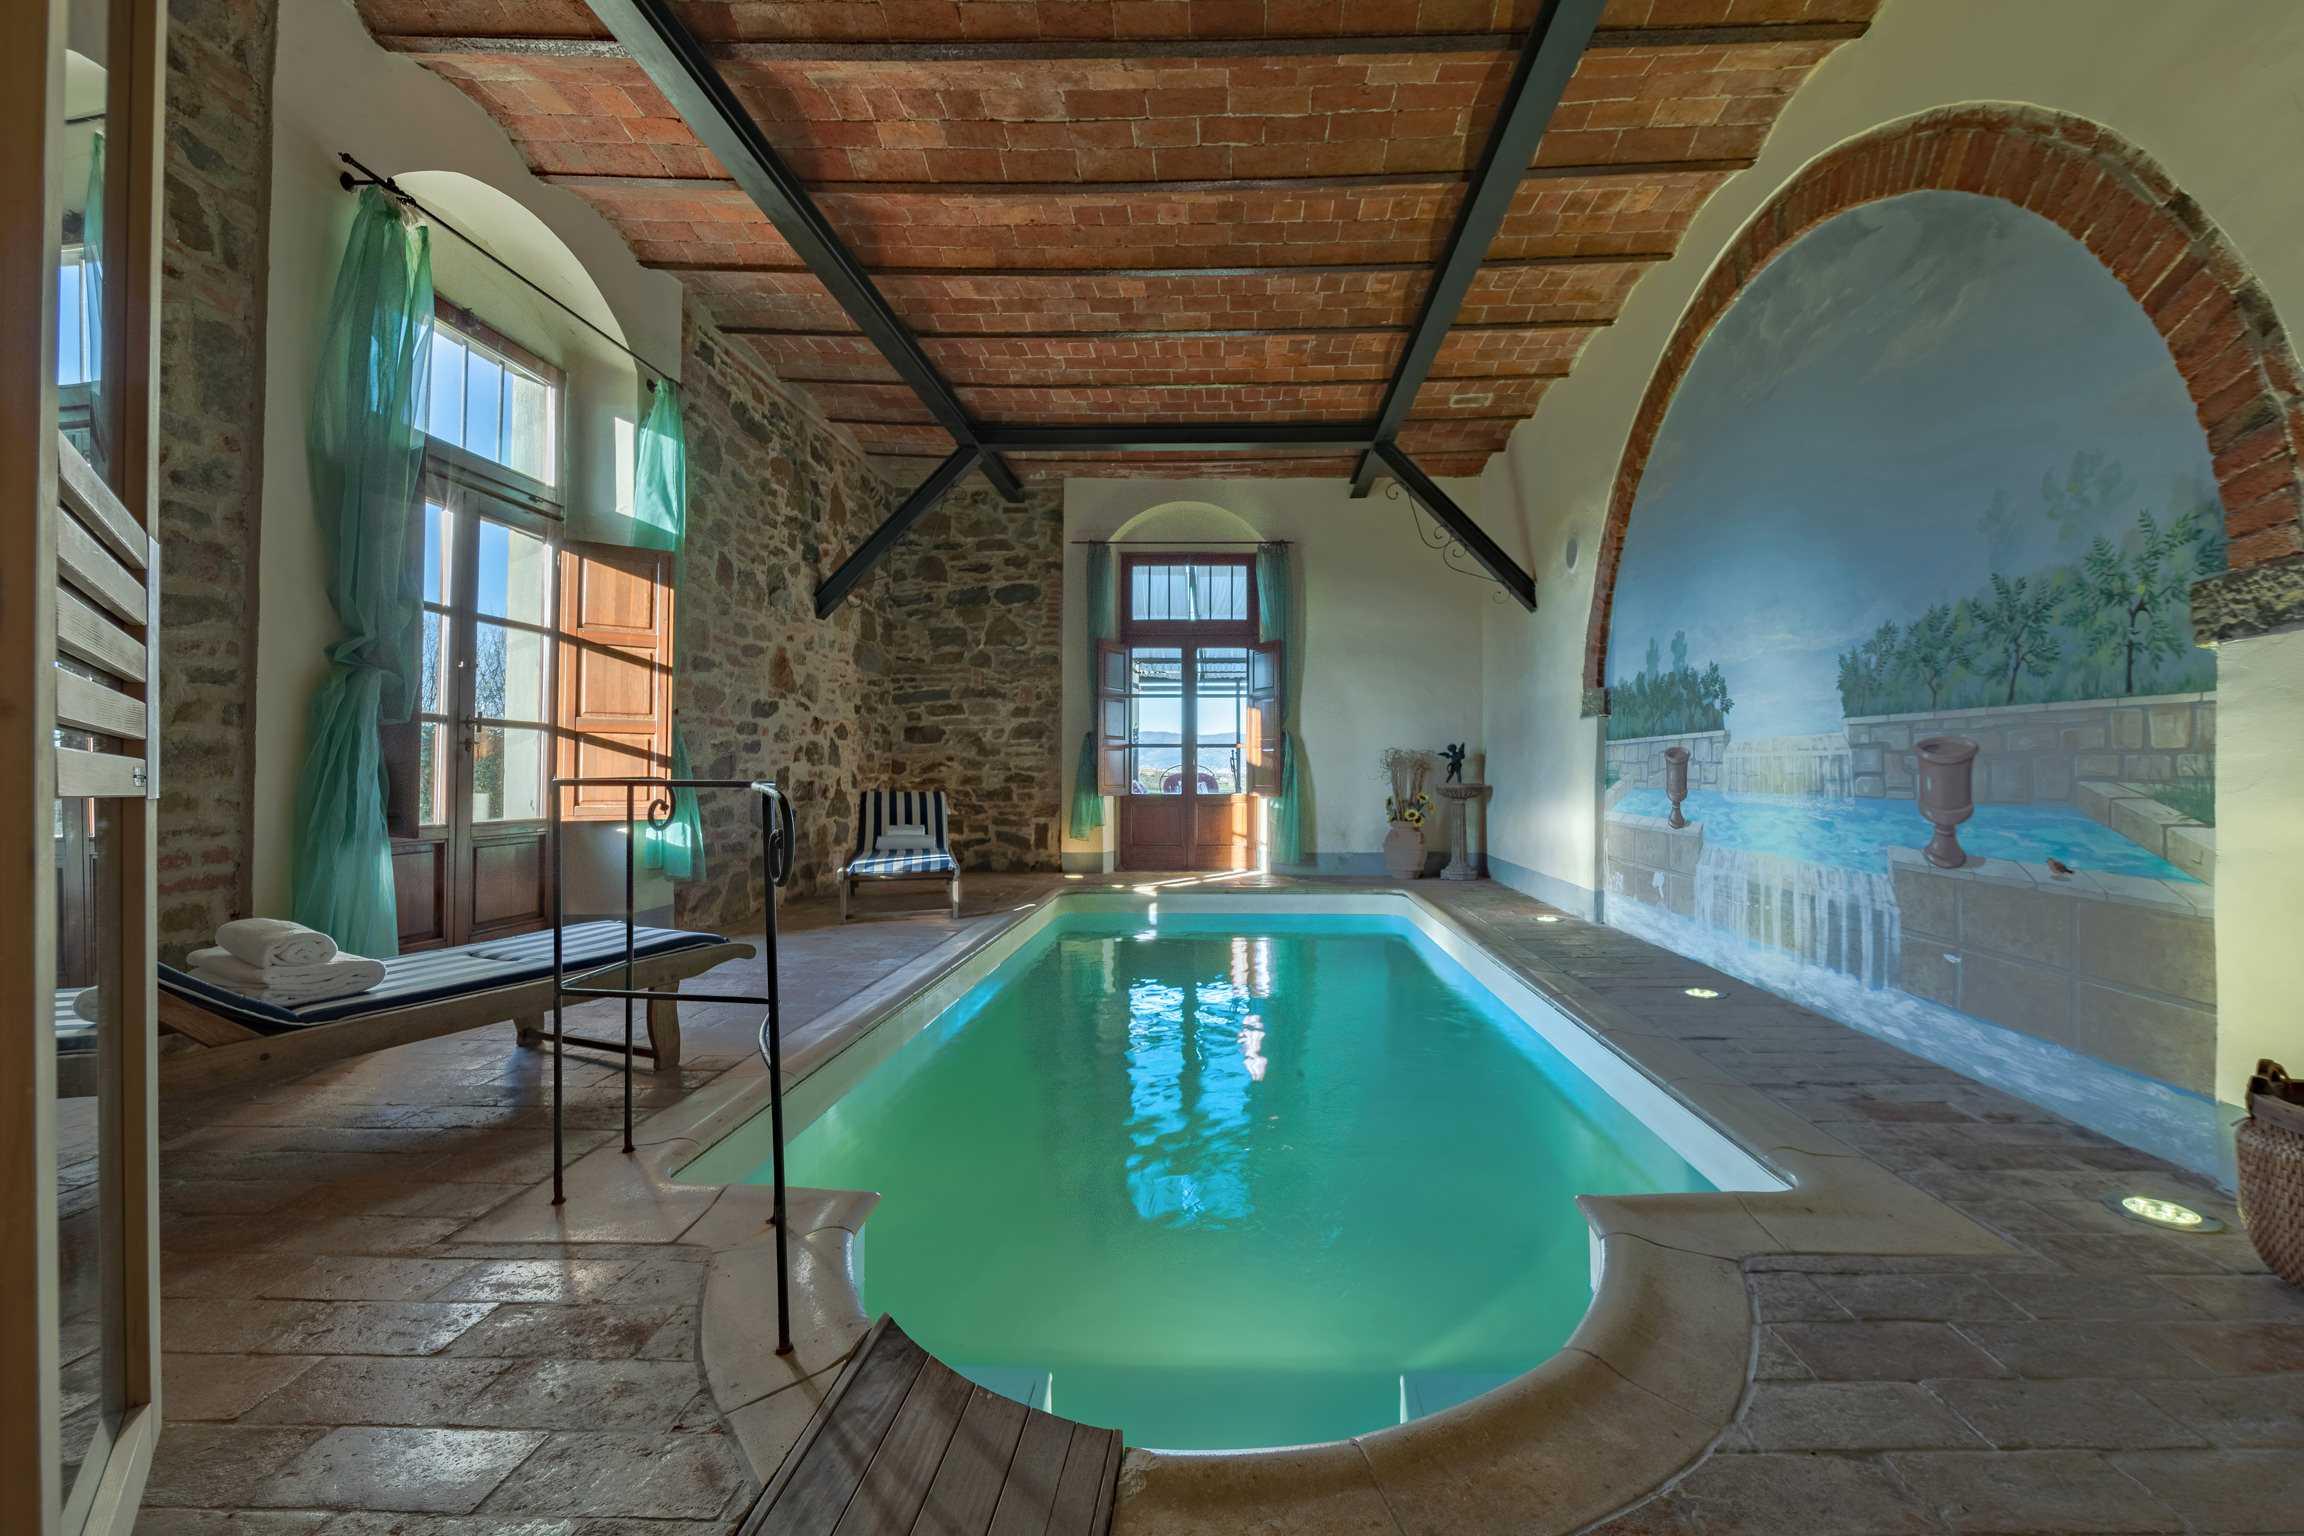 Villa de' Michelangioli binnenzwembad